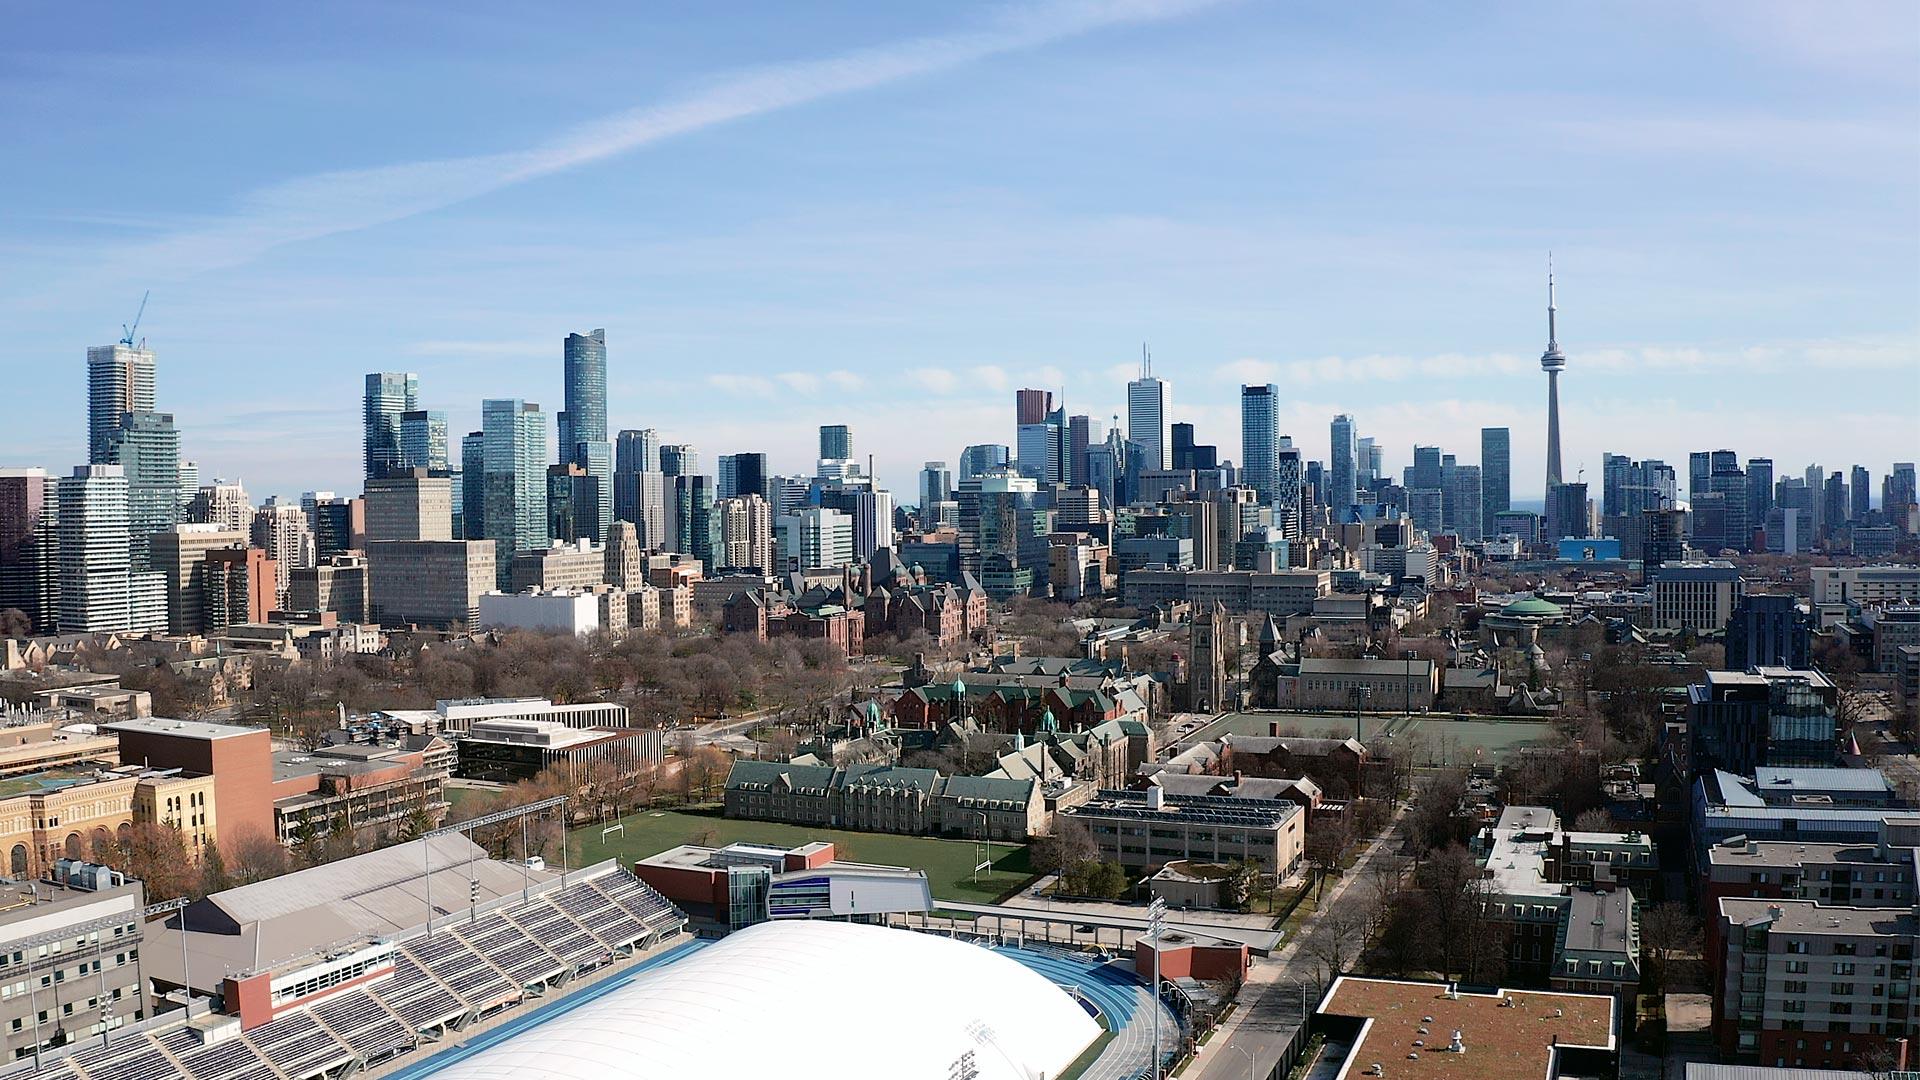 toronto skyline on a sunny day by Toronto wedding videographer kismet creative